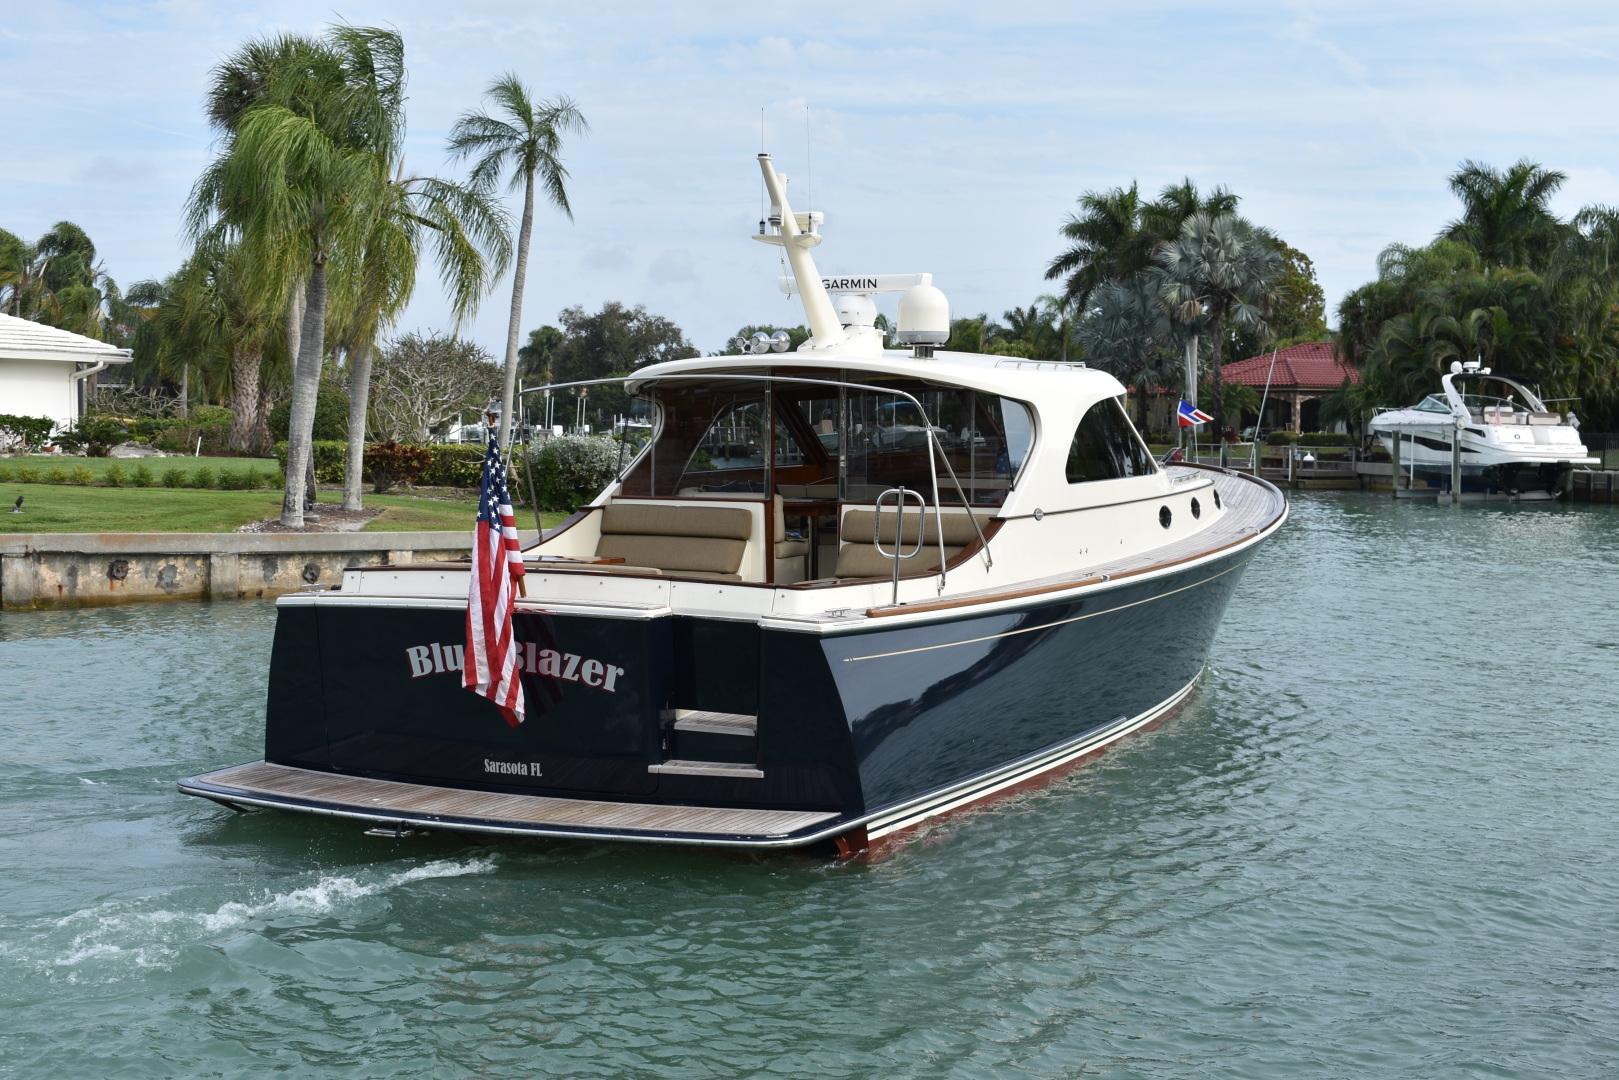 San Juan-48 express 2008-Blue Blazer Sarasota-Florida-United States-1619416 | Thumbnail